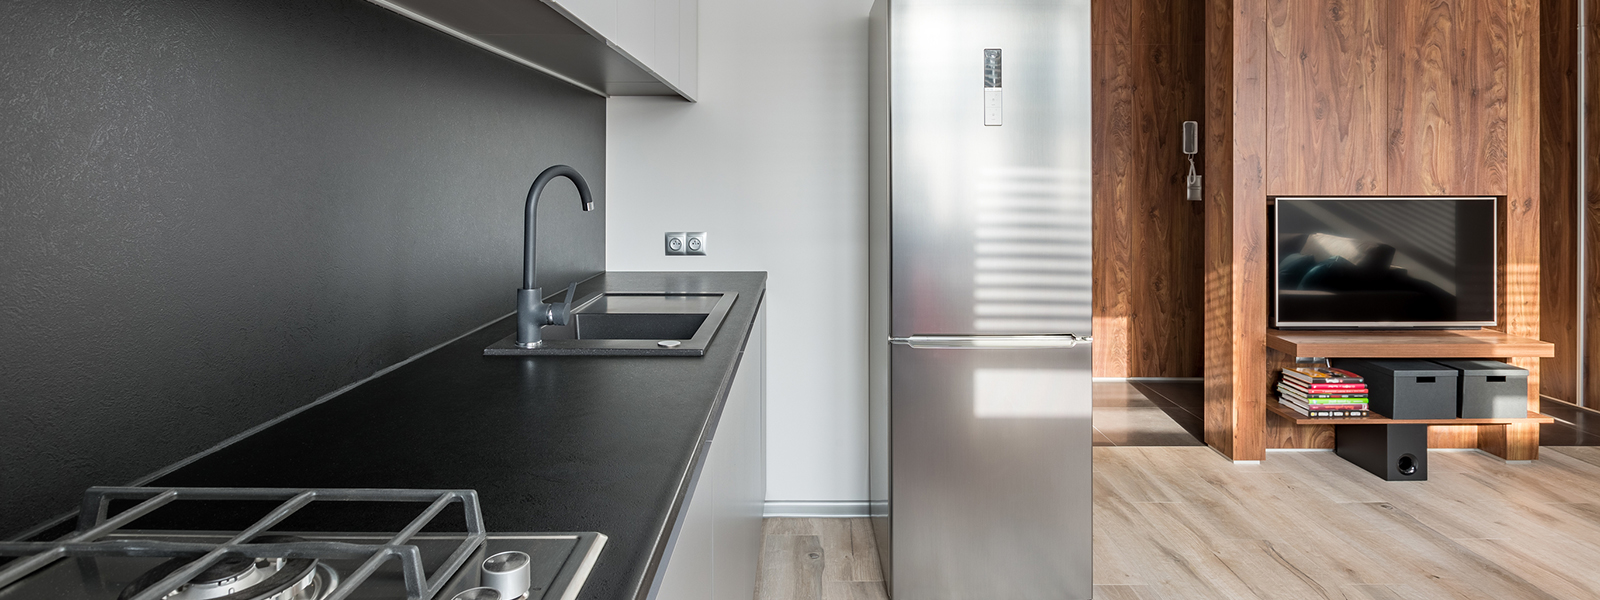 Domestic Appliance Sales